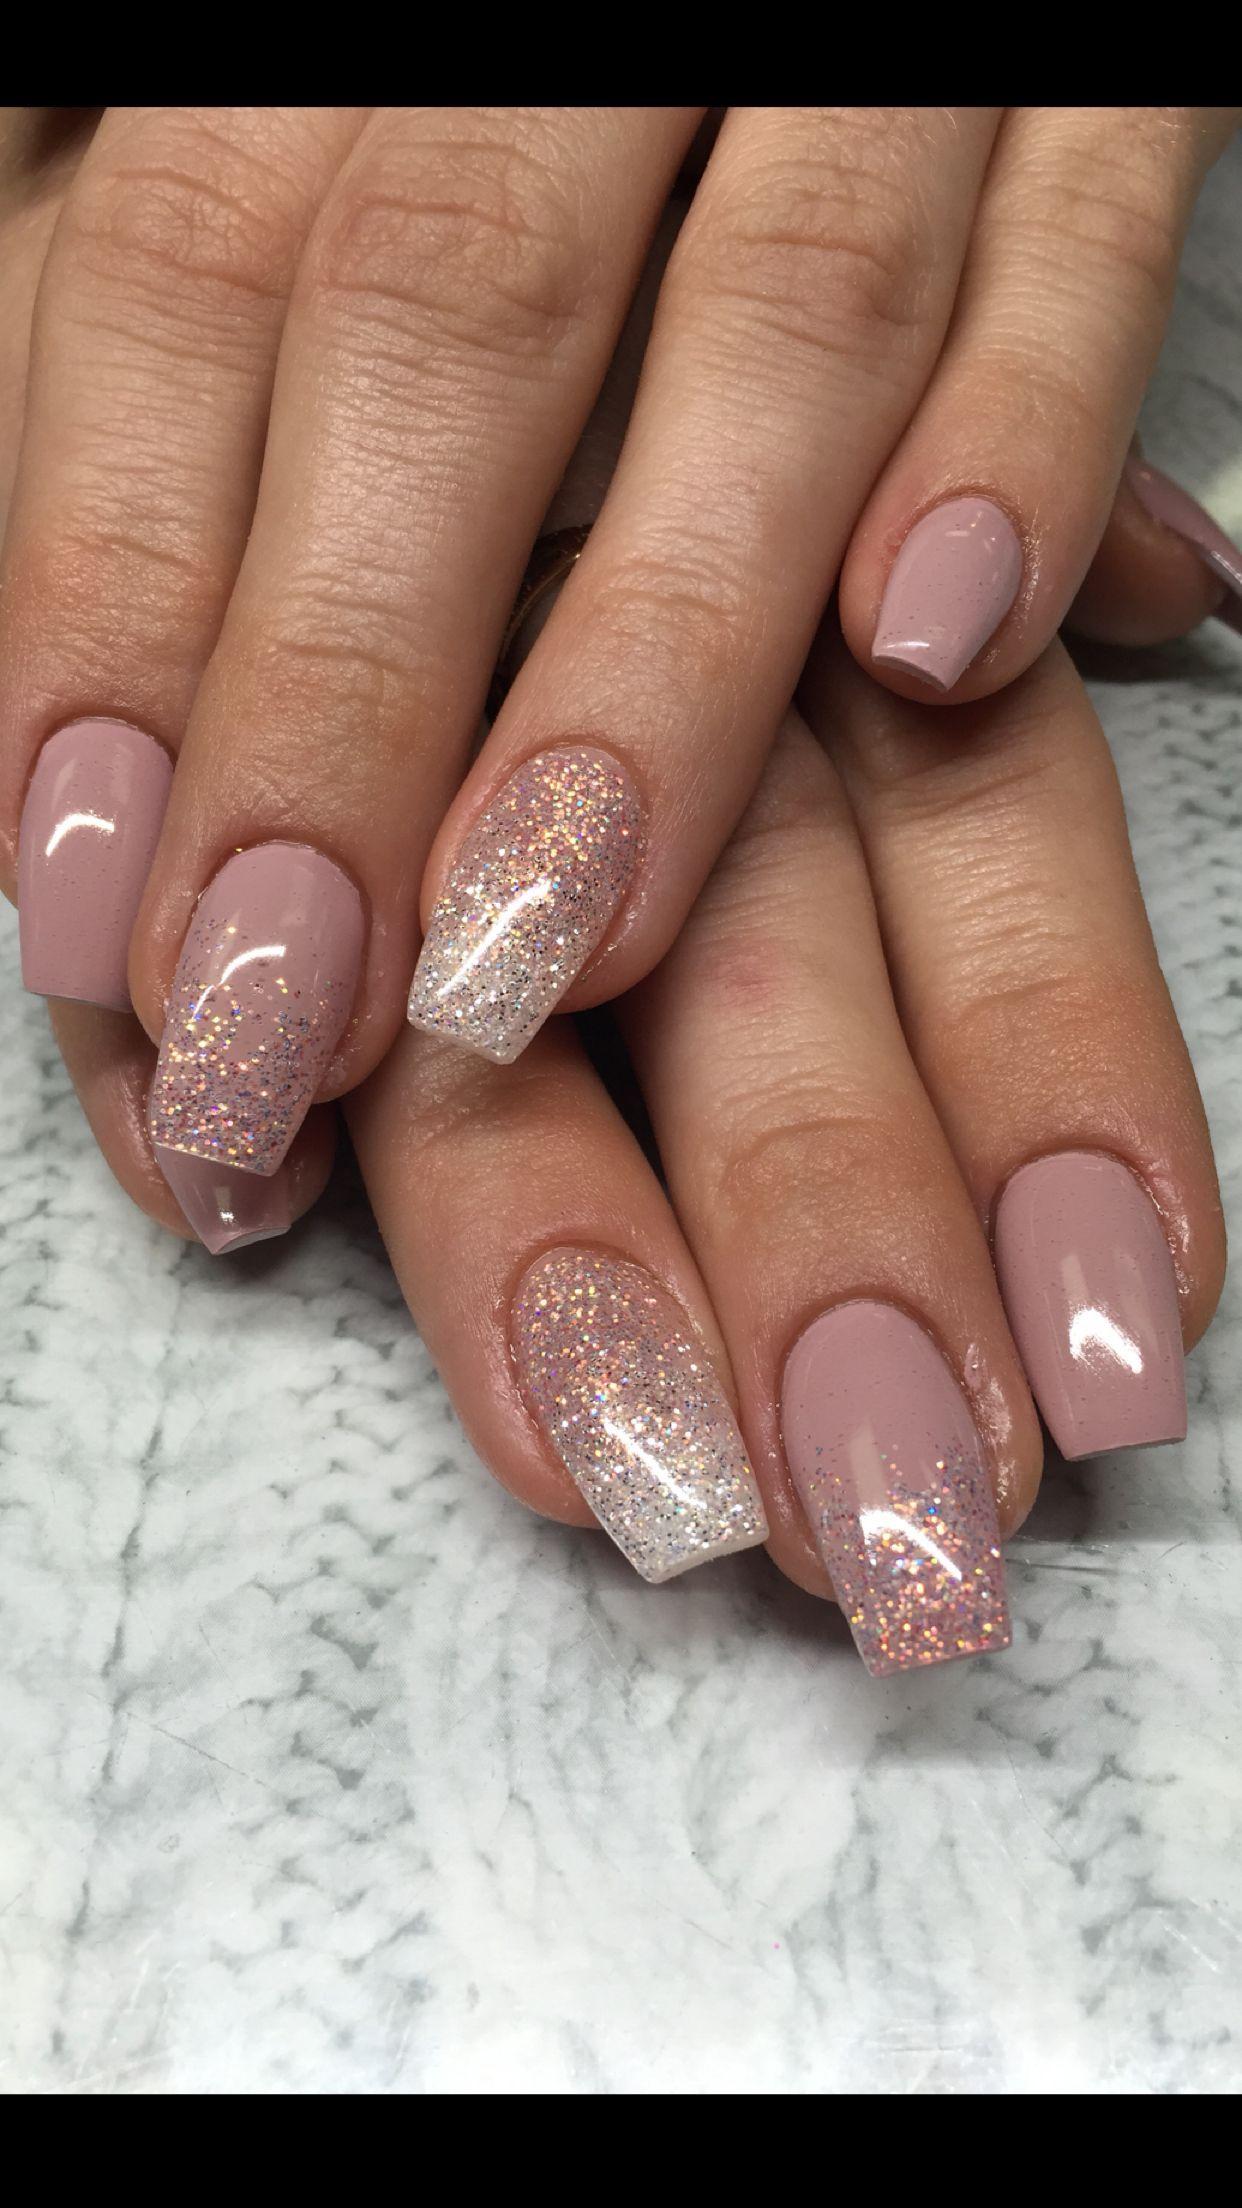 Hard gel nails ballerina coffin light elegance your churn with sweet ...